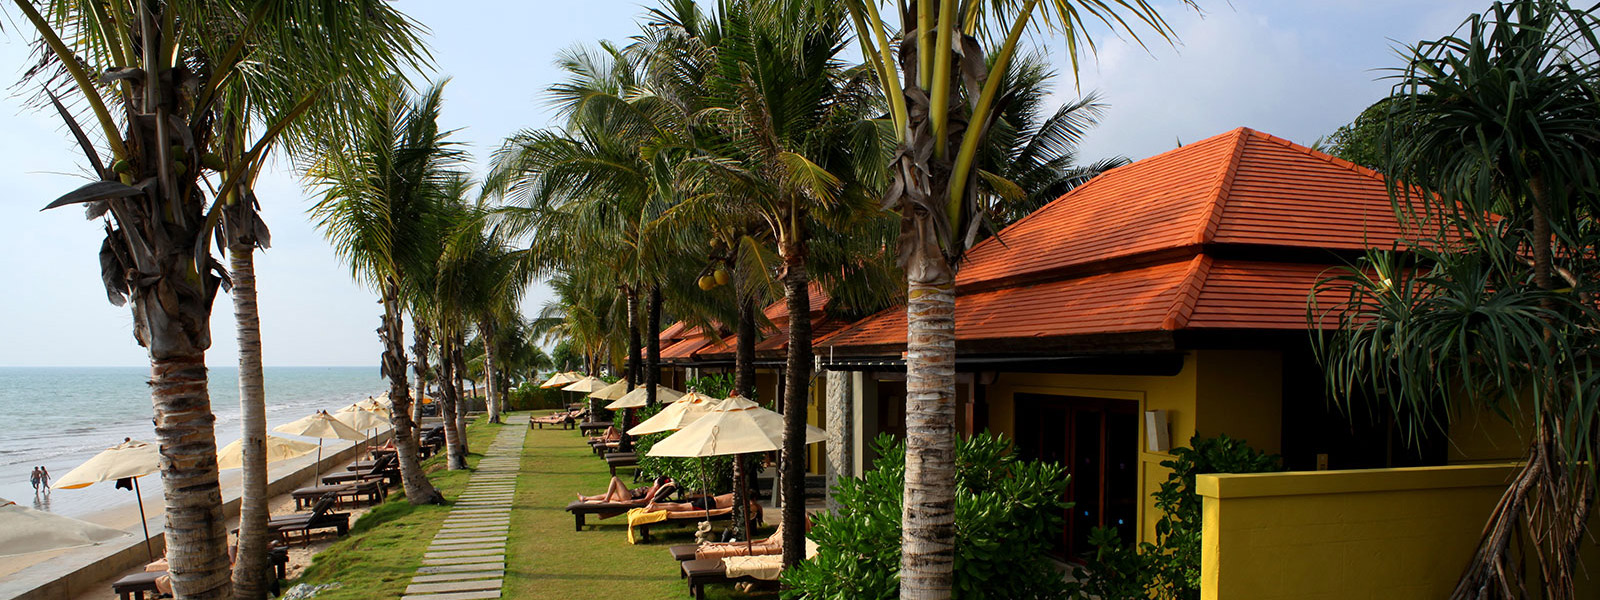 Chongfah Resort Khao Lak - Seaview Bungalow